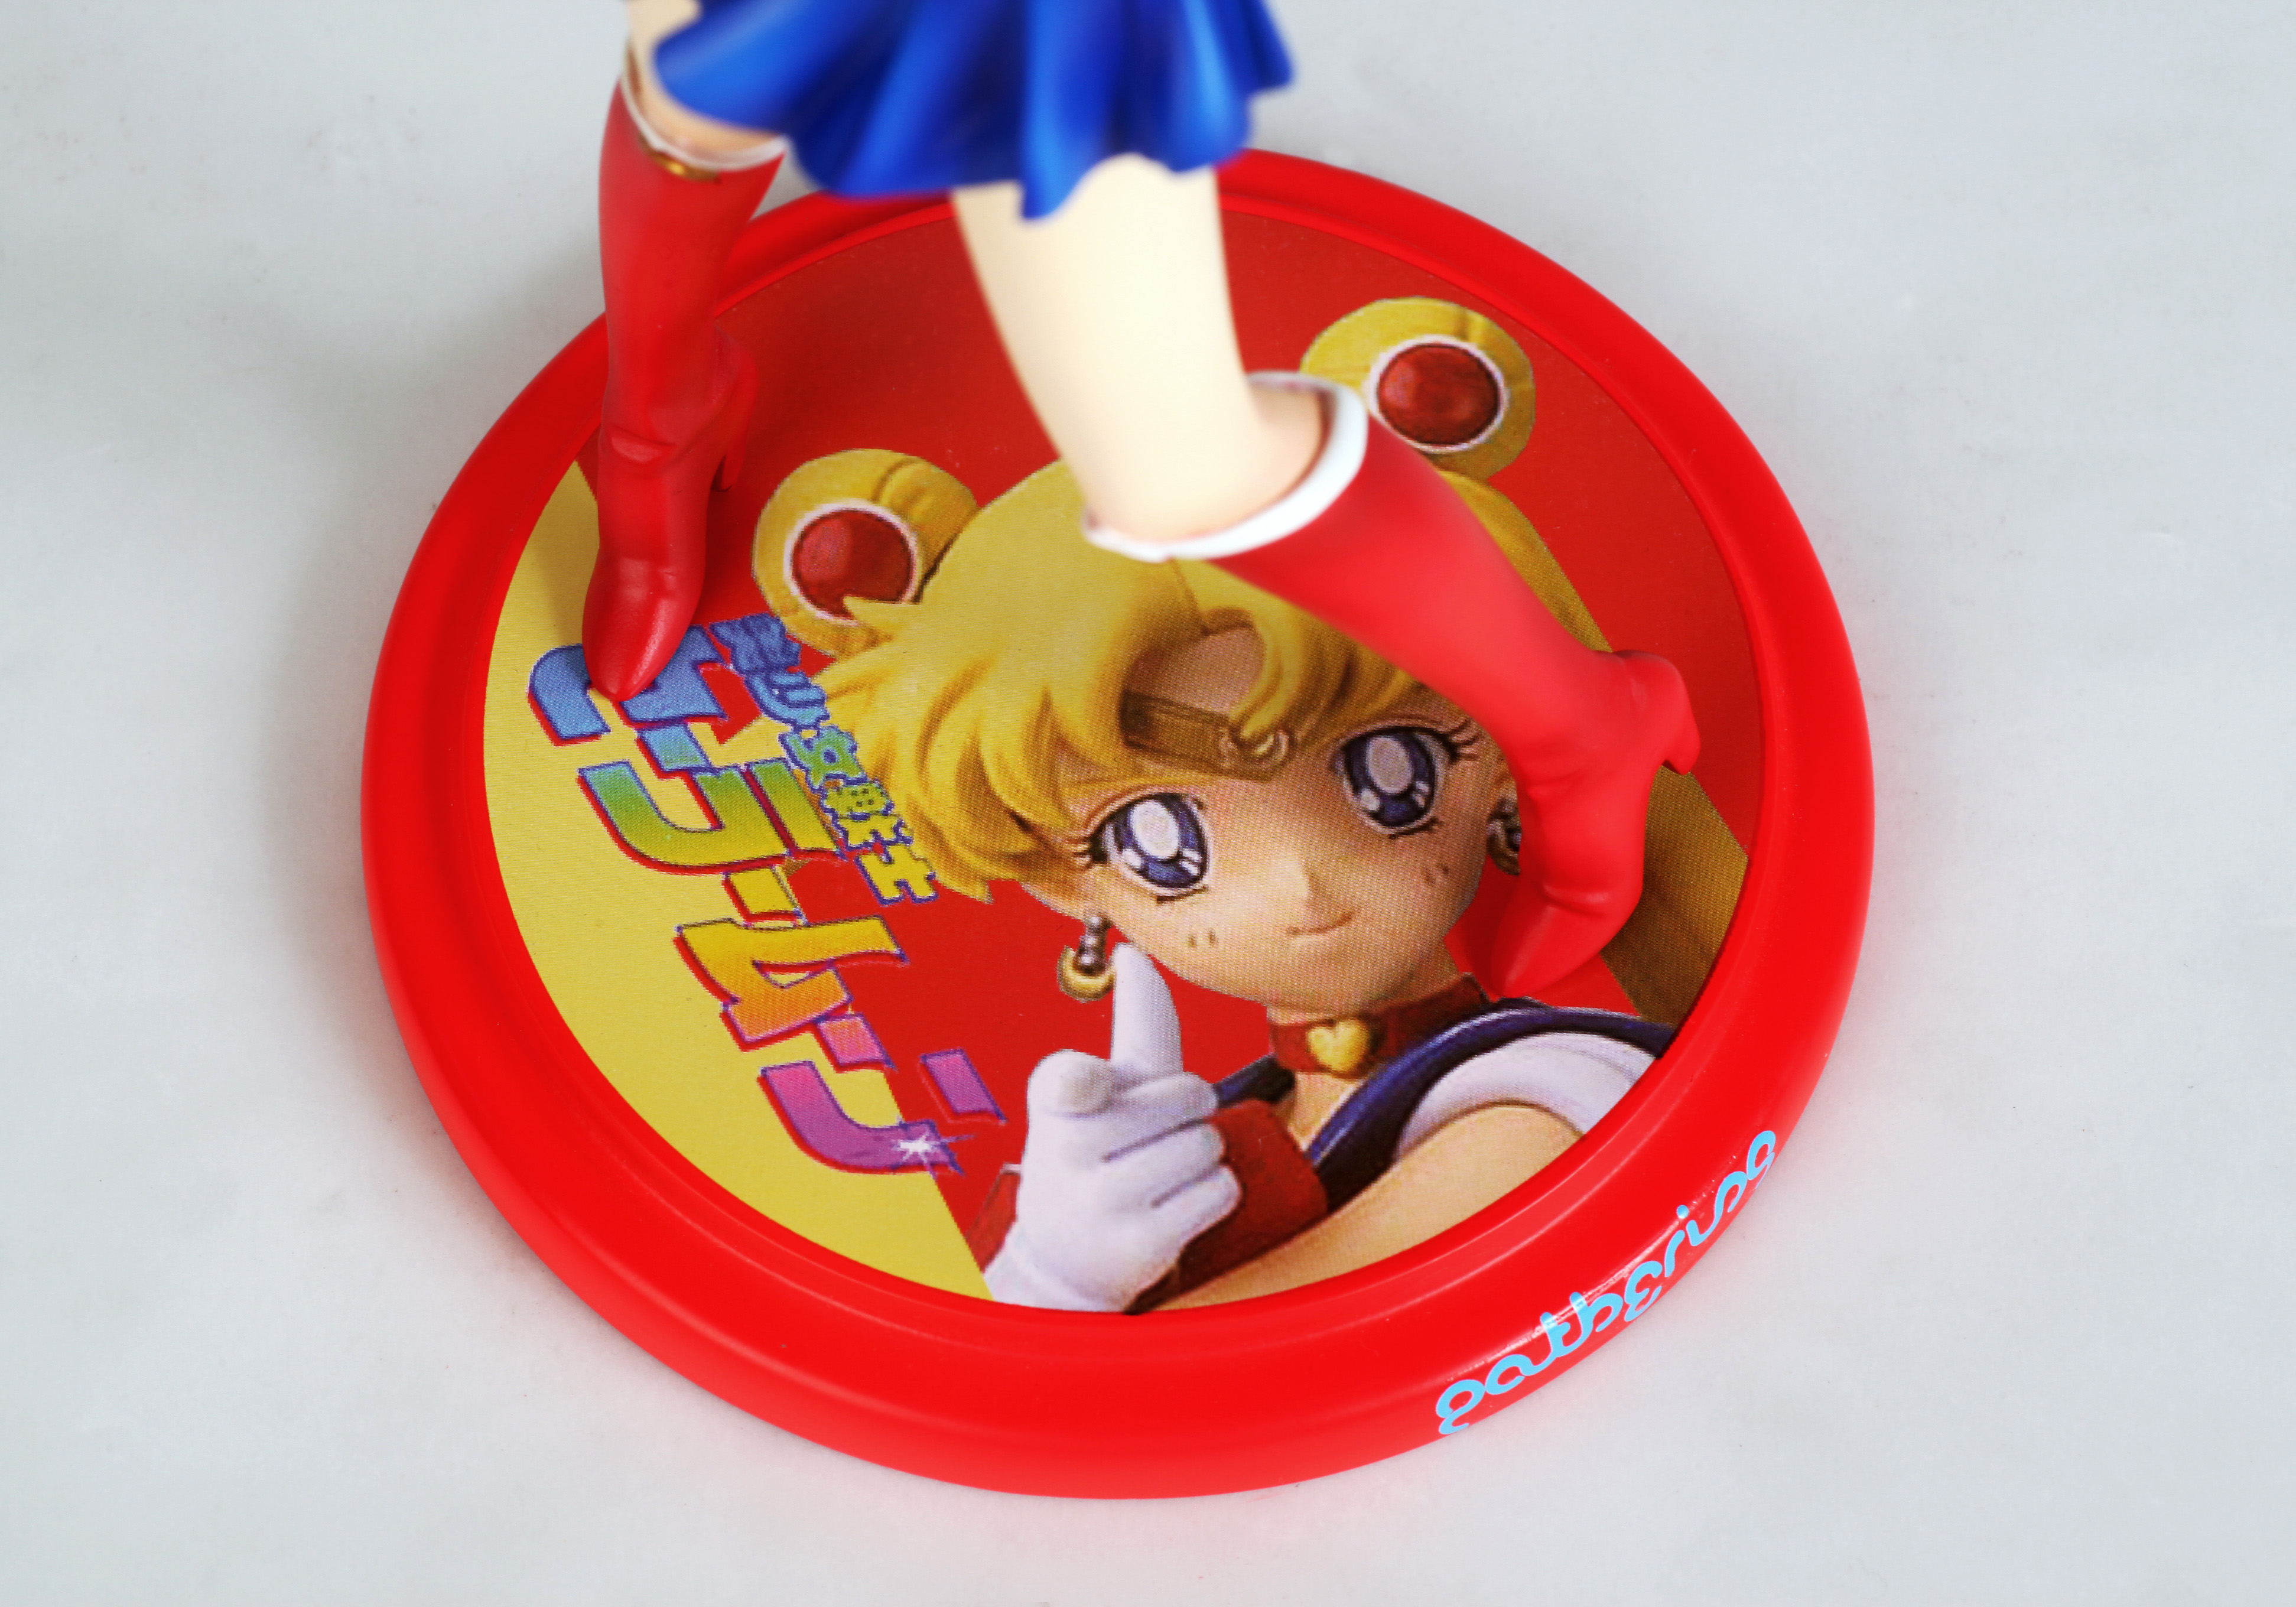 Sailor Moon Usagi Tsukino prepainted figure haruhichan.com Sailor Moon Anime figure 13